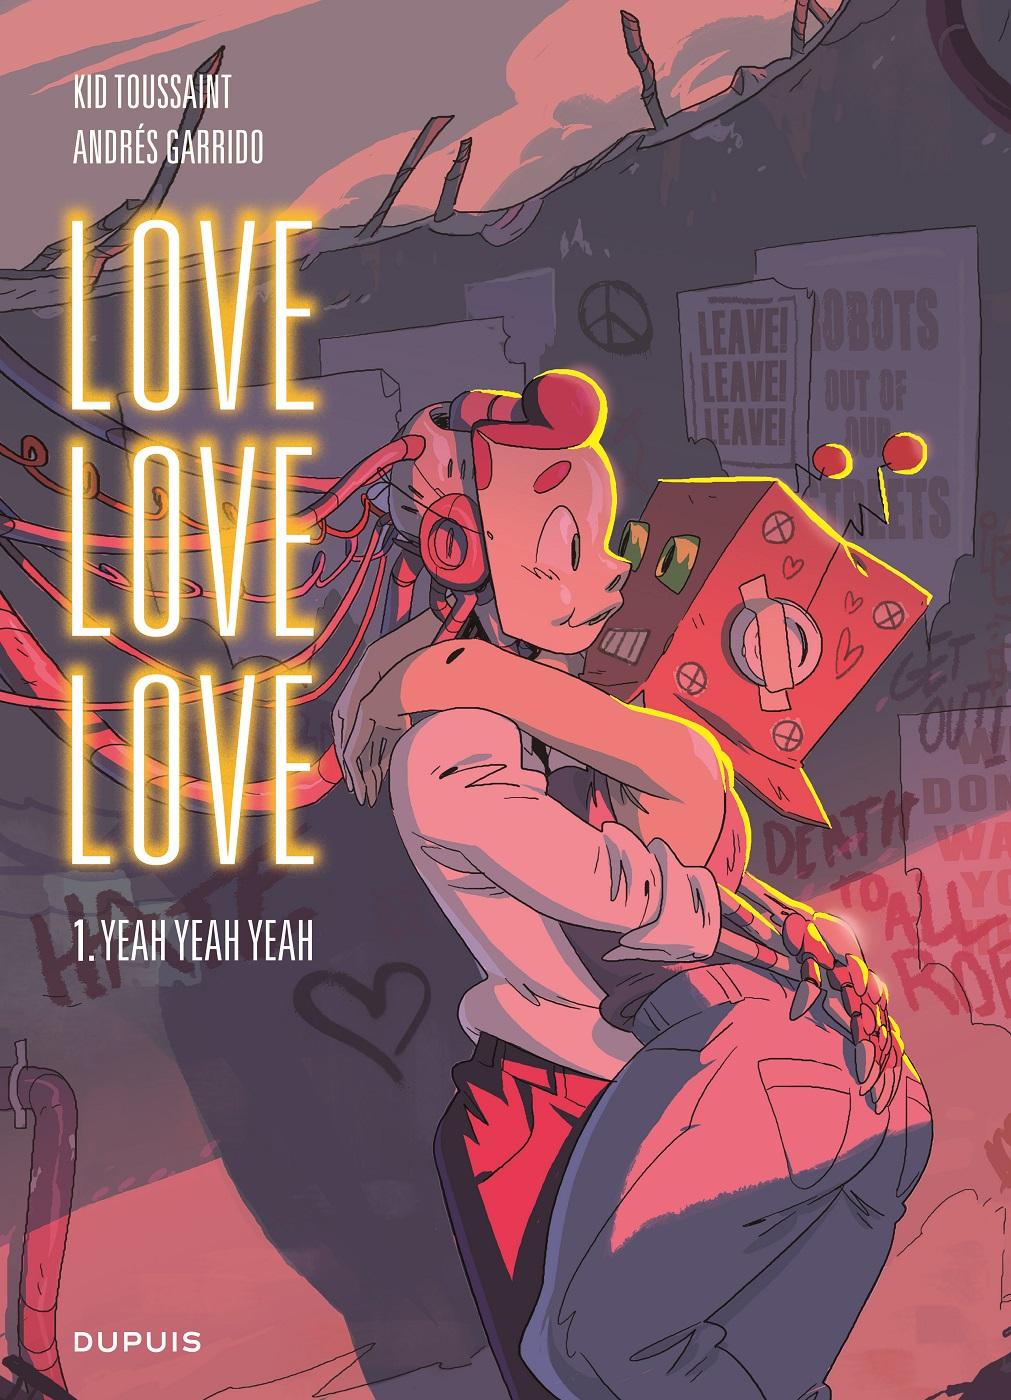 couverture love love love